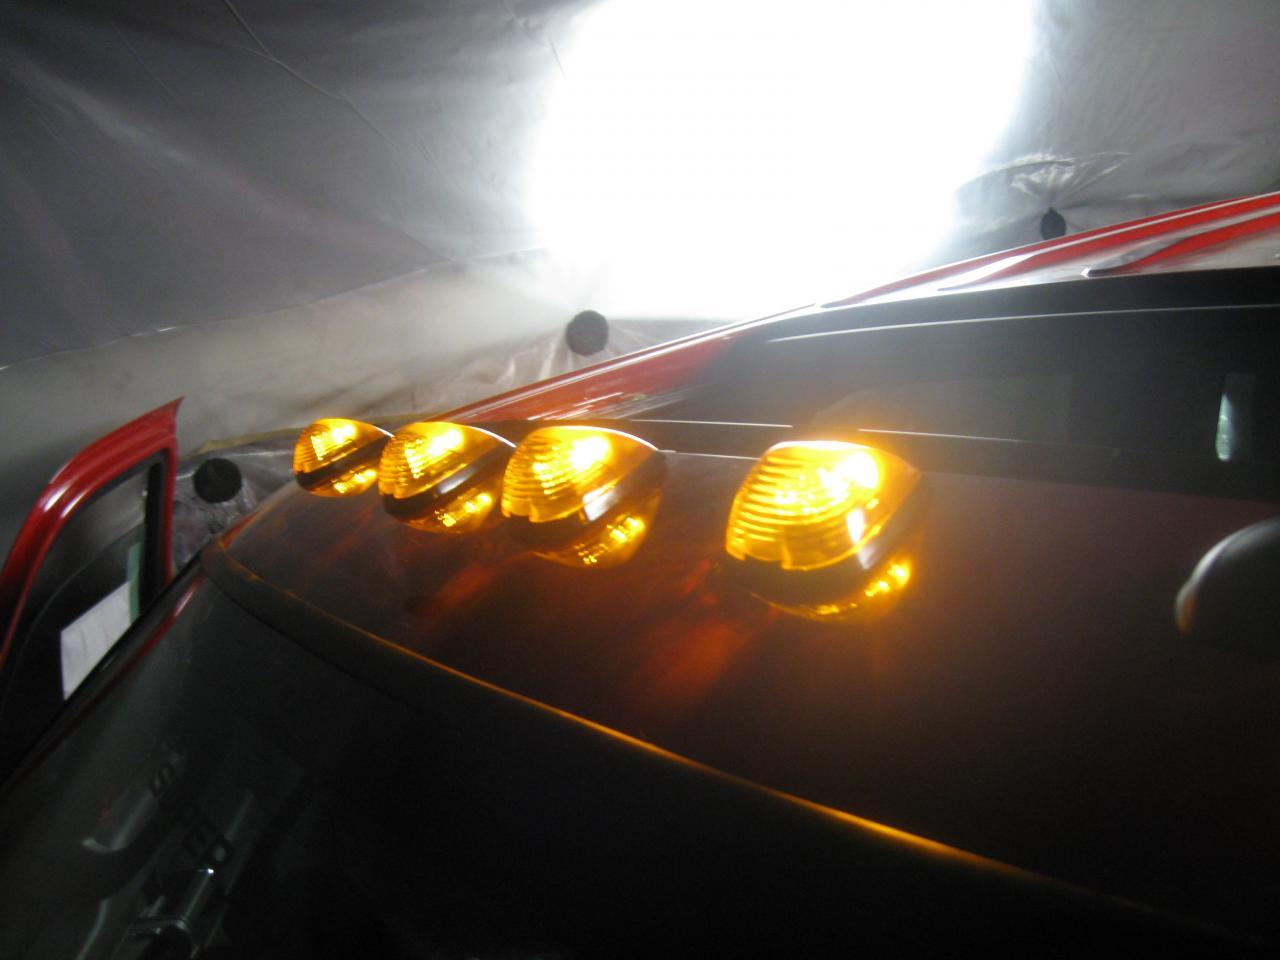 Emergency/Warning Lighting